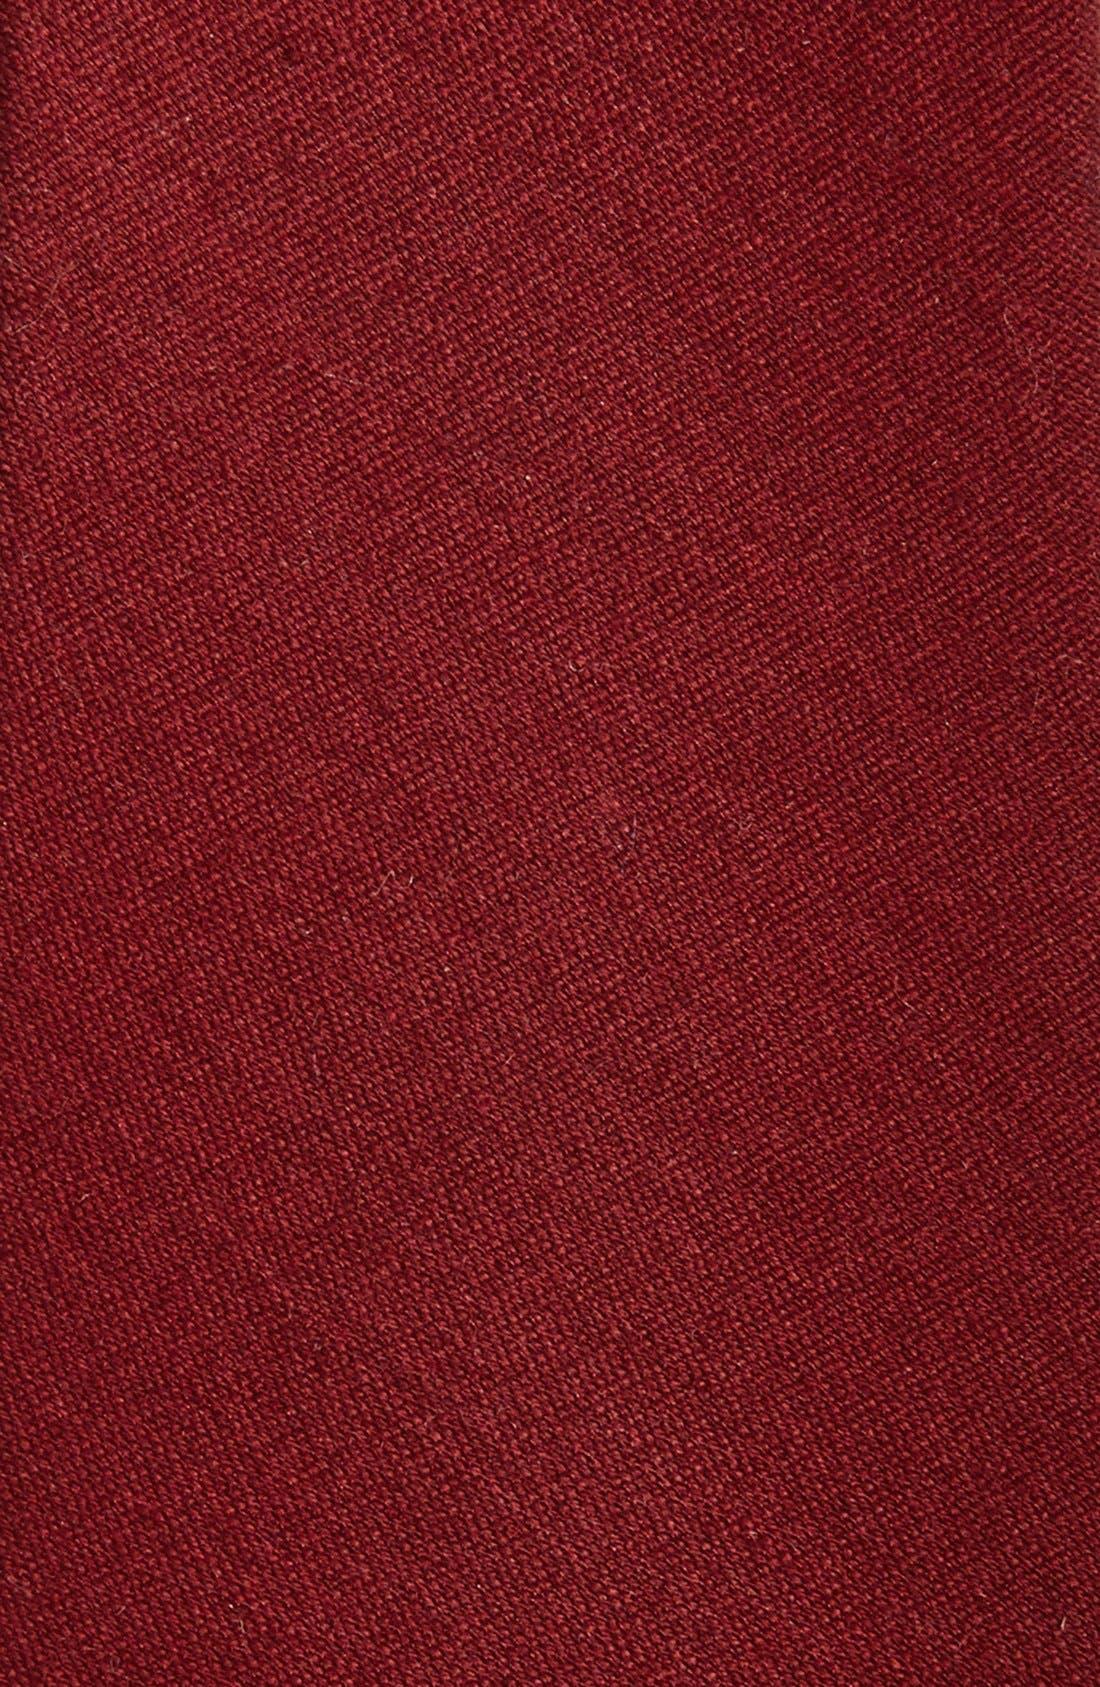 Alternate Image 2  - The Tie Bar Wool & Silk Solid Tie (Online Only)